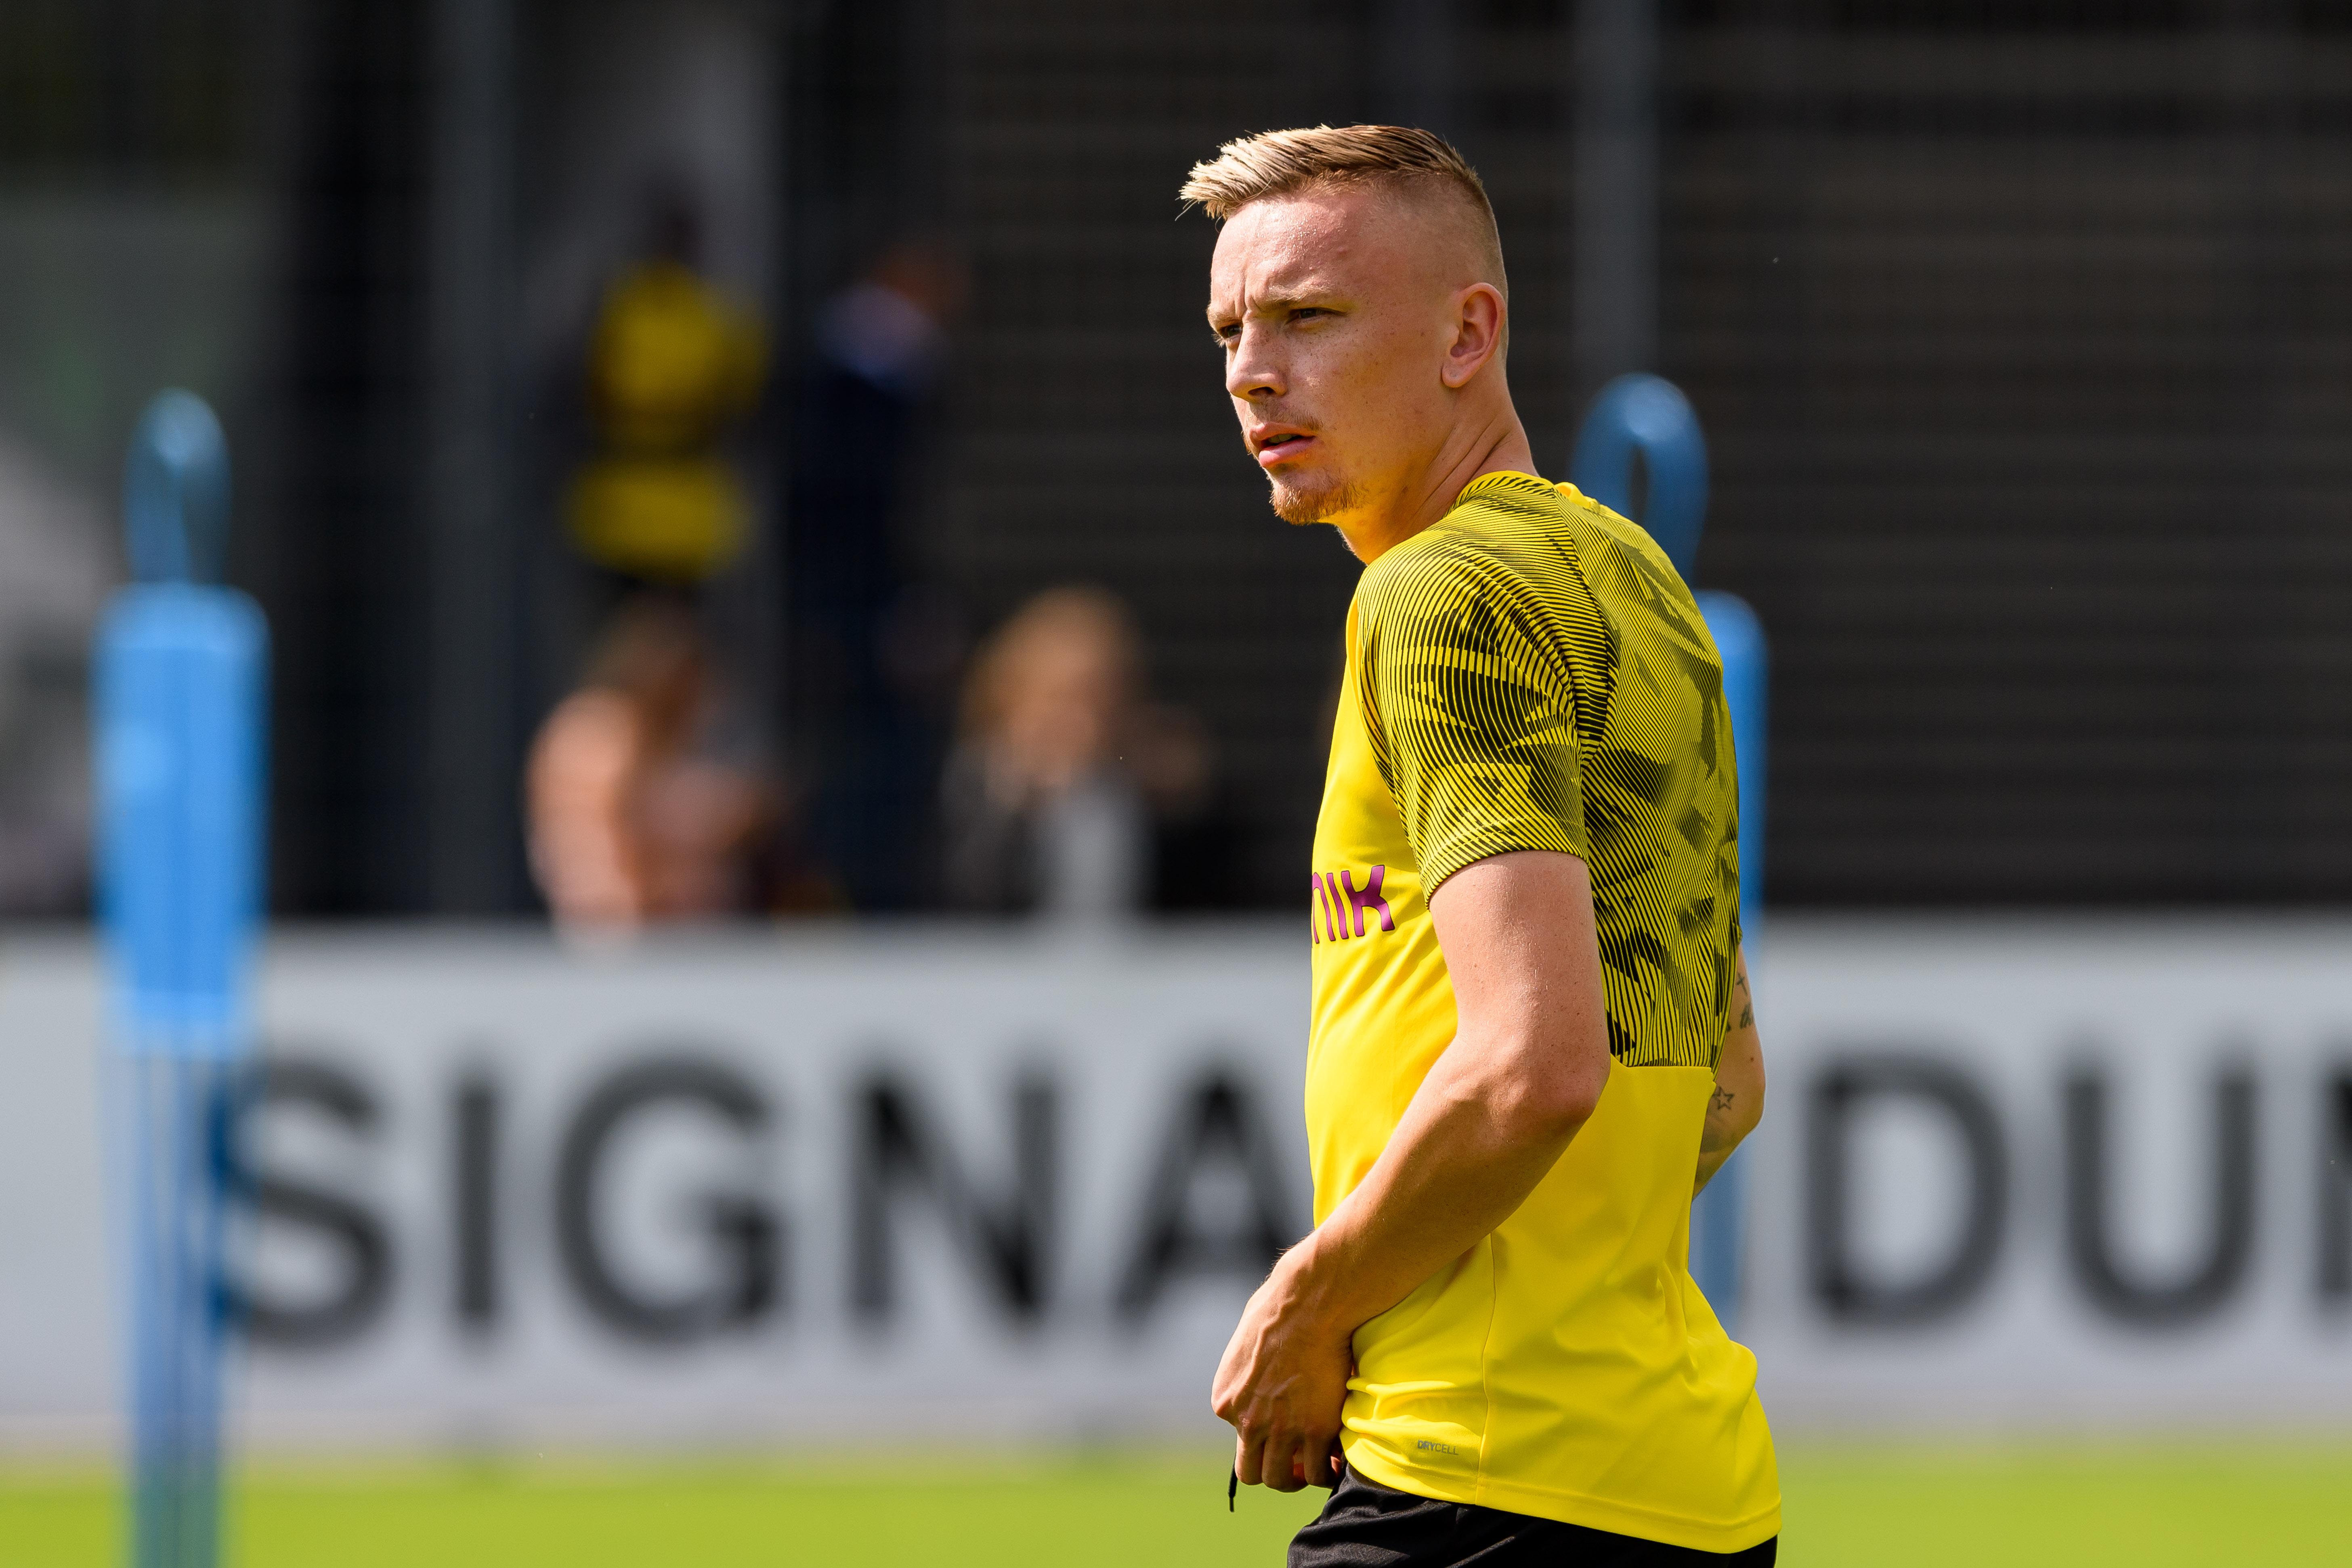 Borussia Dortmund Training Session